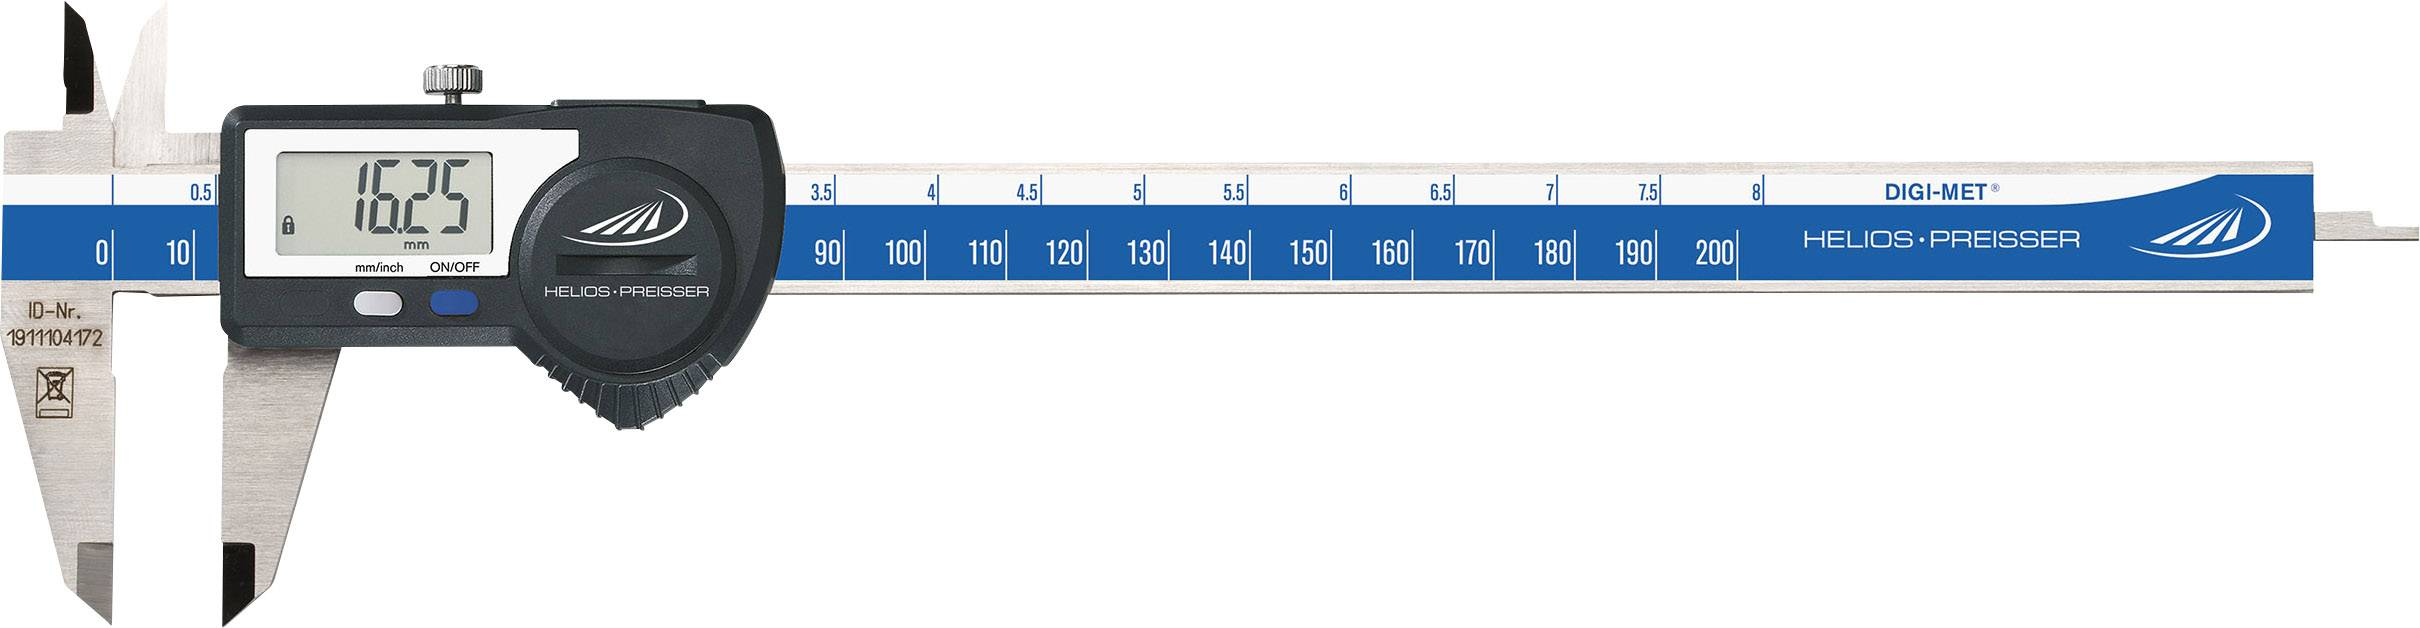 Digitálne posuvné meradlo Helios Preisser DIGI-MET 1320 519, rozsah merania 200 mm